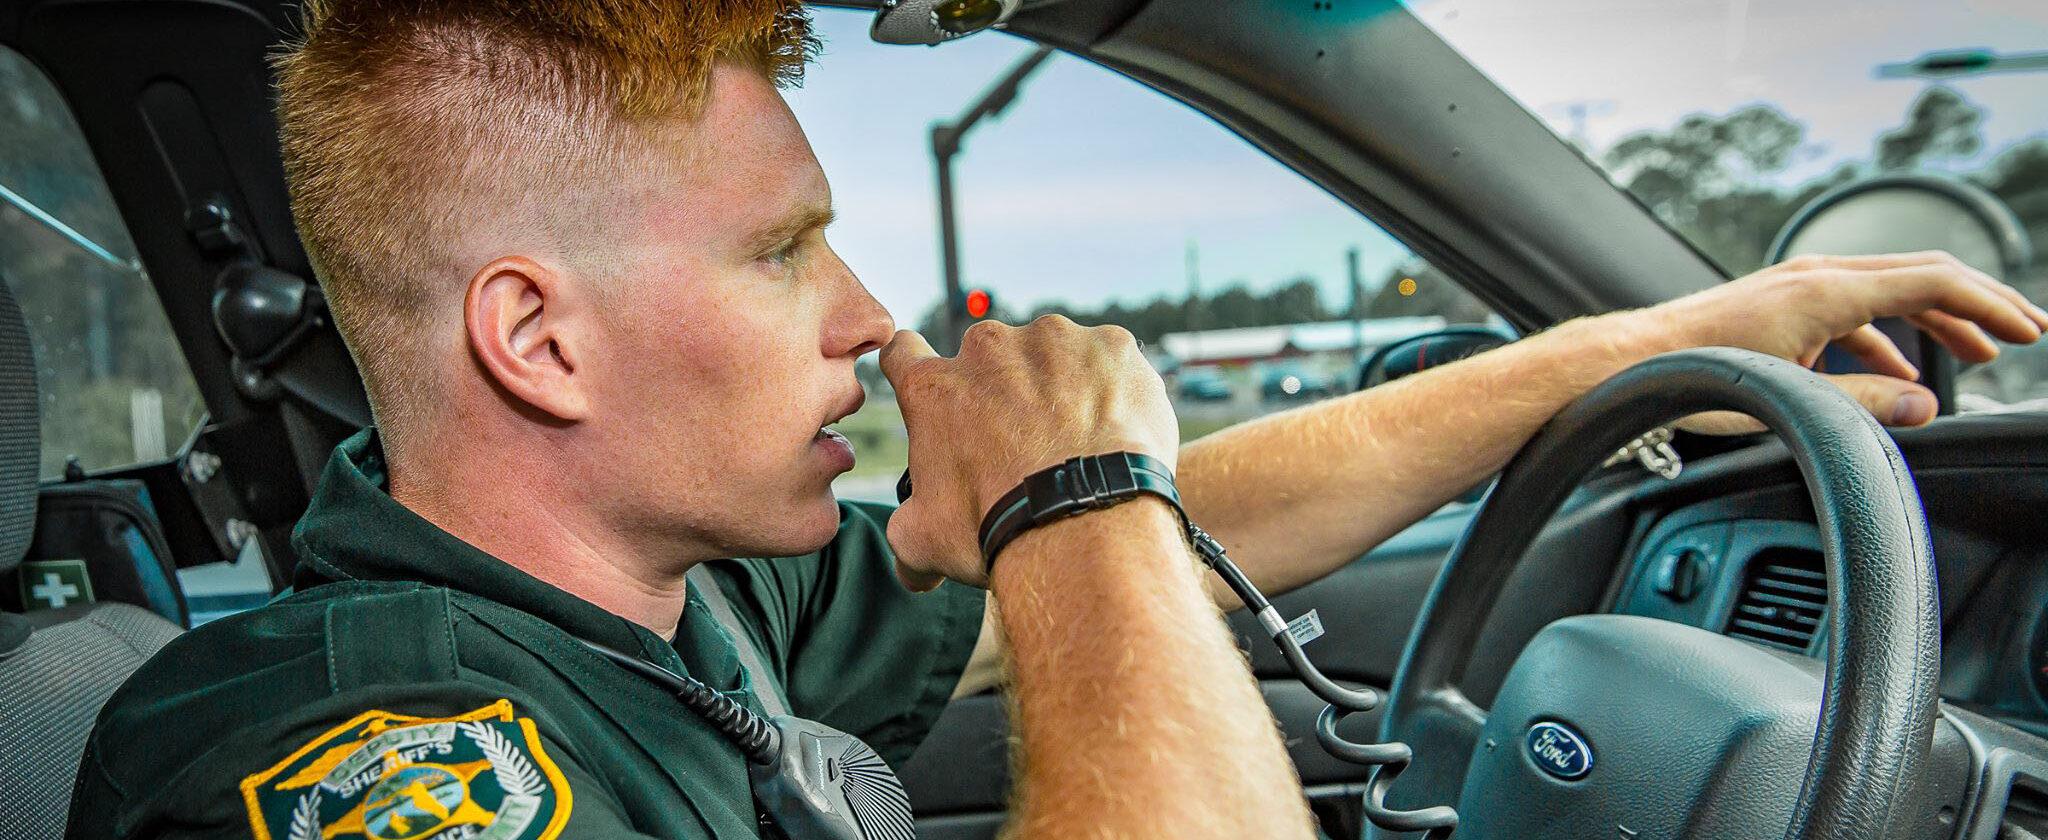 Walton County deputy responding to a call